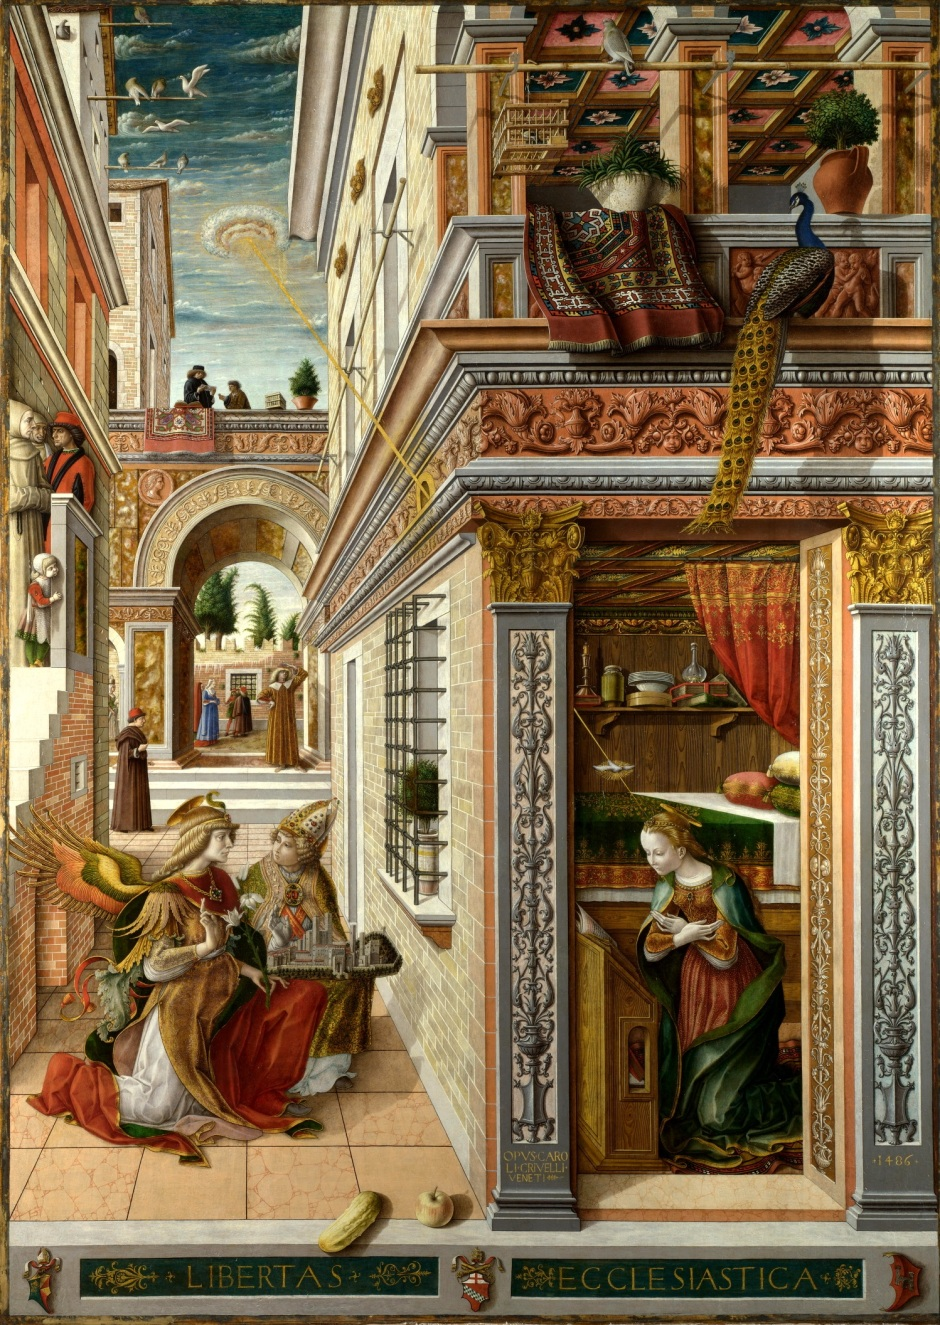 Carlo Crivelli, The Annunciation with St Emidius, 1486